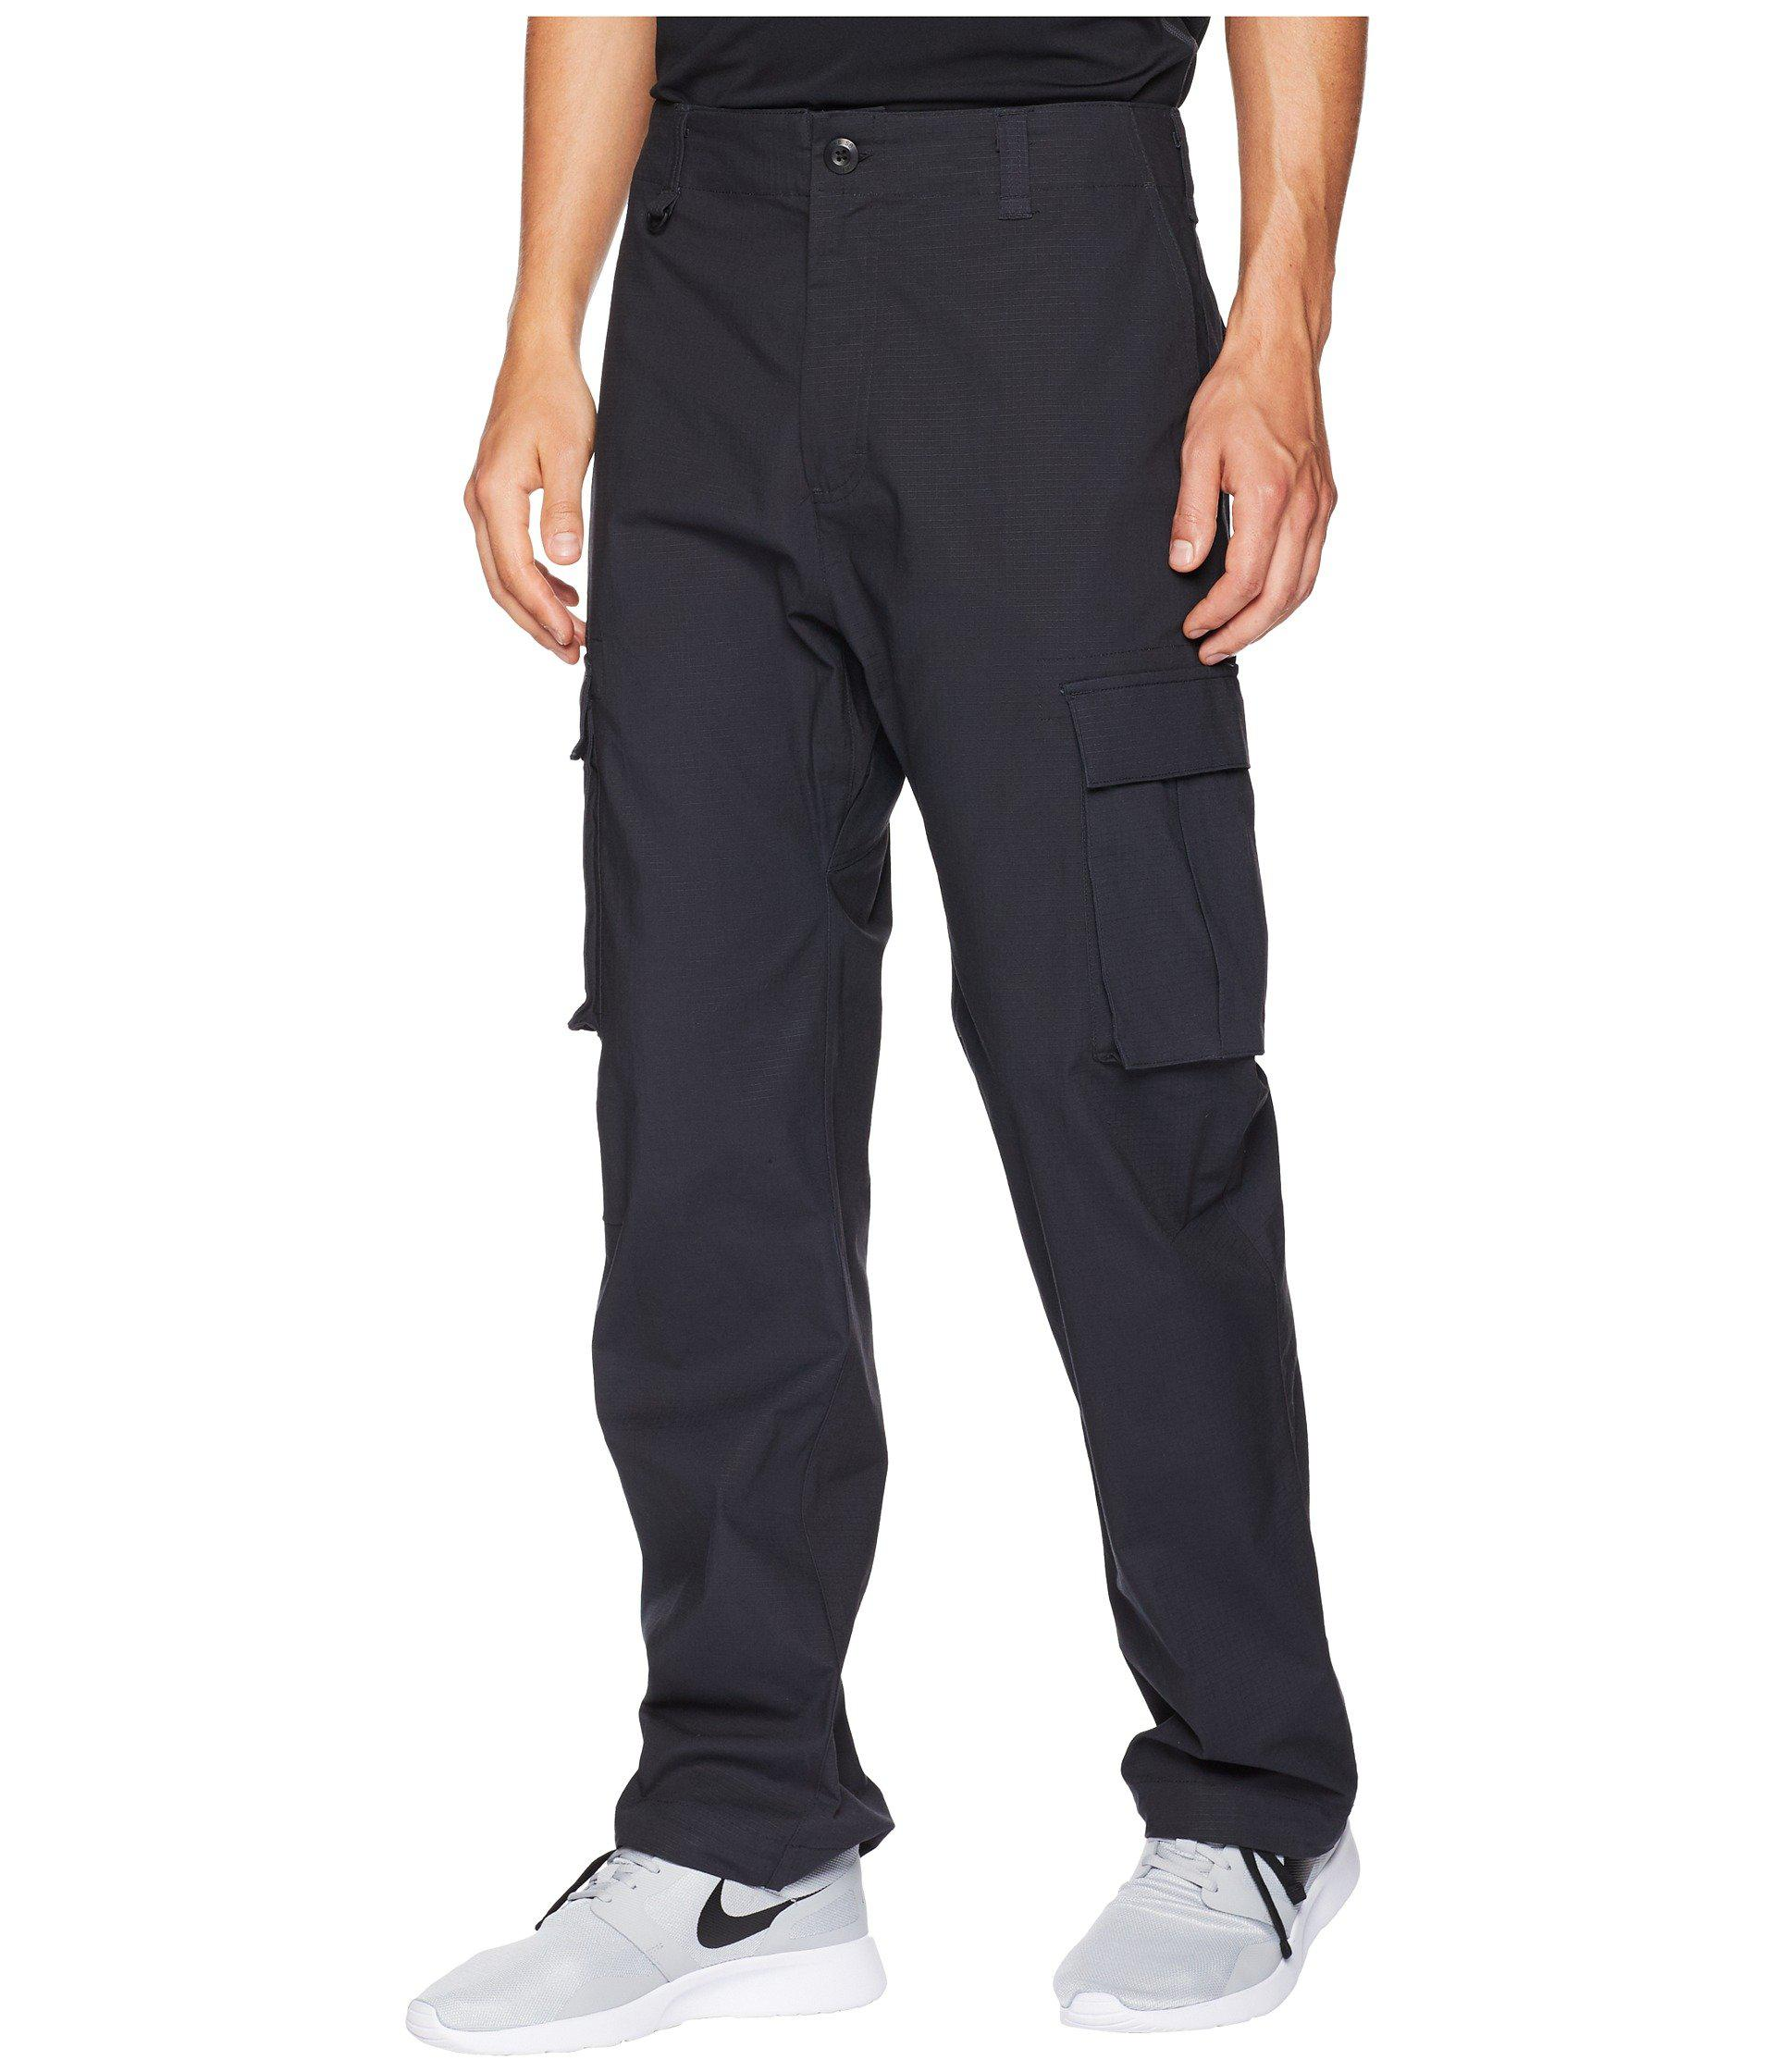 82032c3801d9 Nike - Sb Flex Pants Fit To Move Cargo (black) Men s Casual Pants for. View  fullscreen